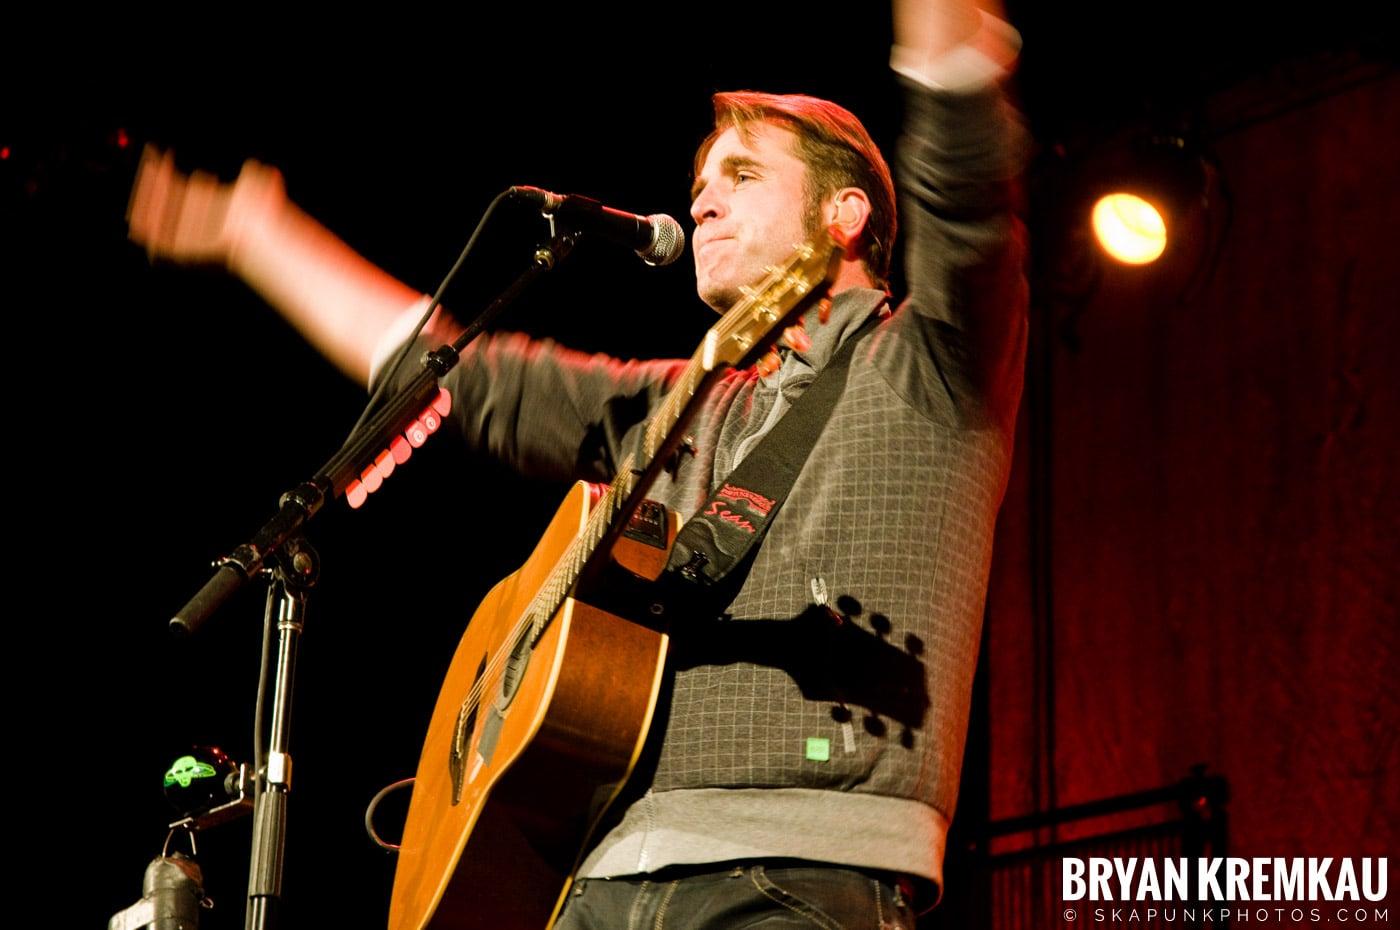 Great Big Sea @ Tarrytown Music Hall, Tarrytown, NY - 10.10.09 (2)